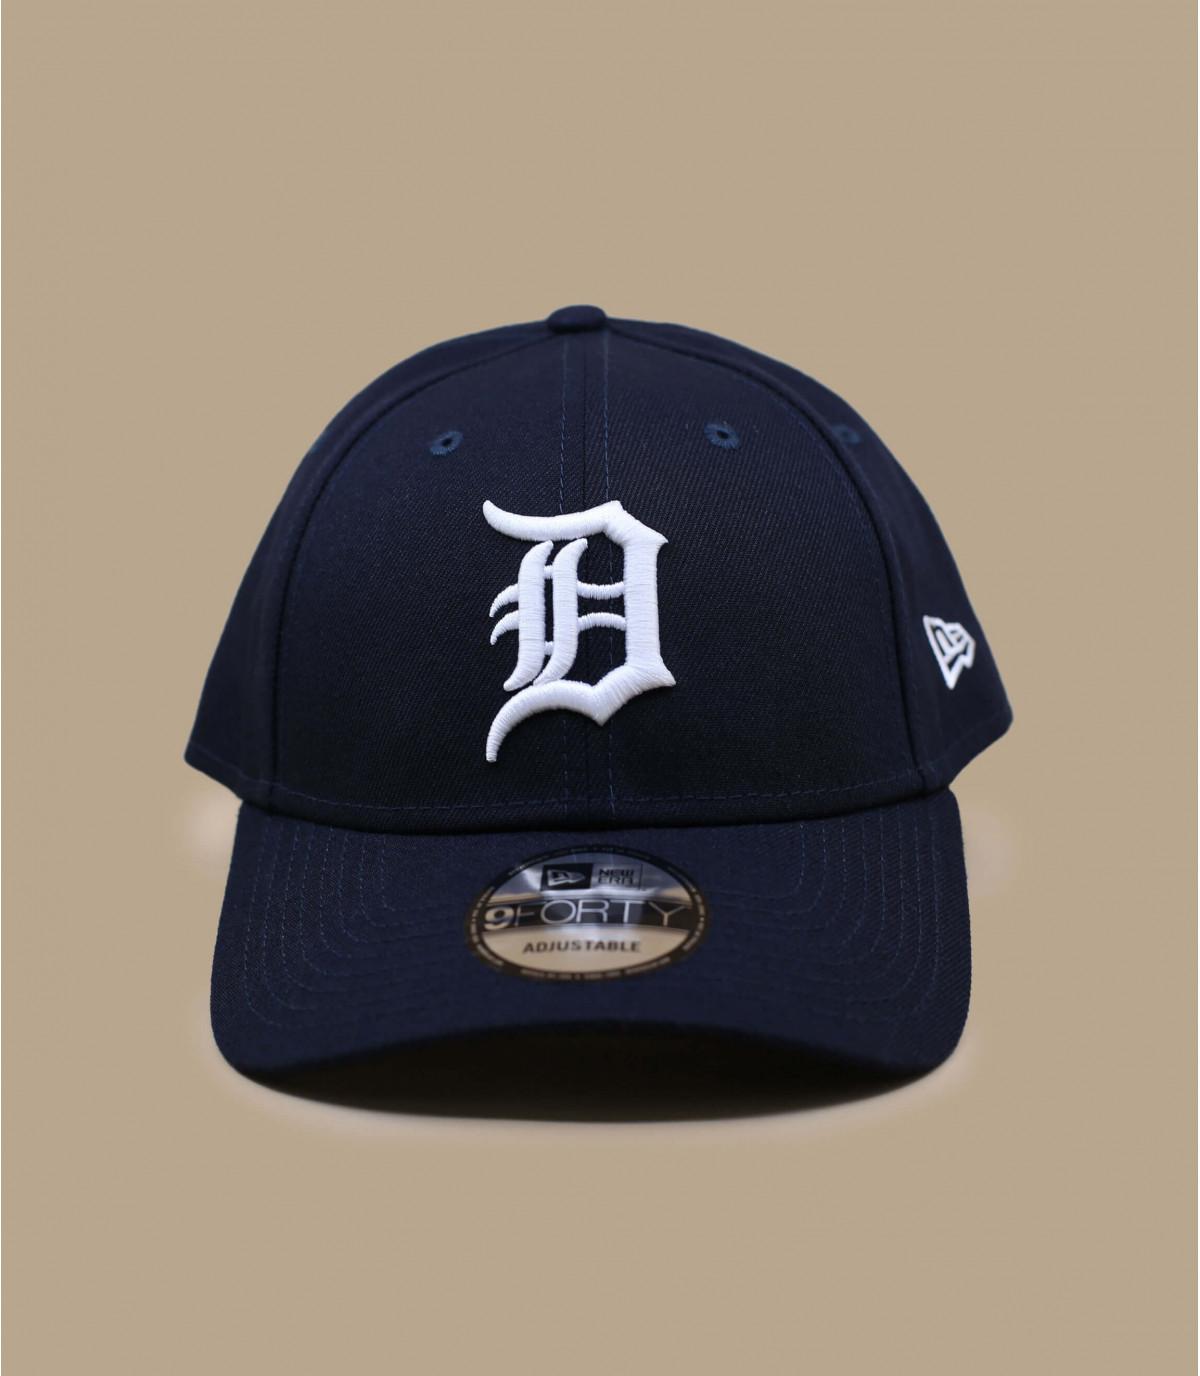 Detroit Tiger baseballcap